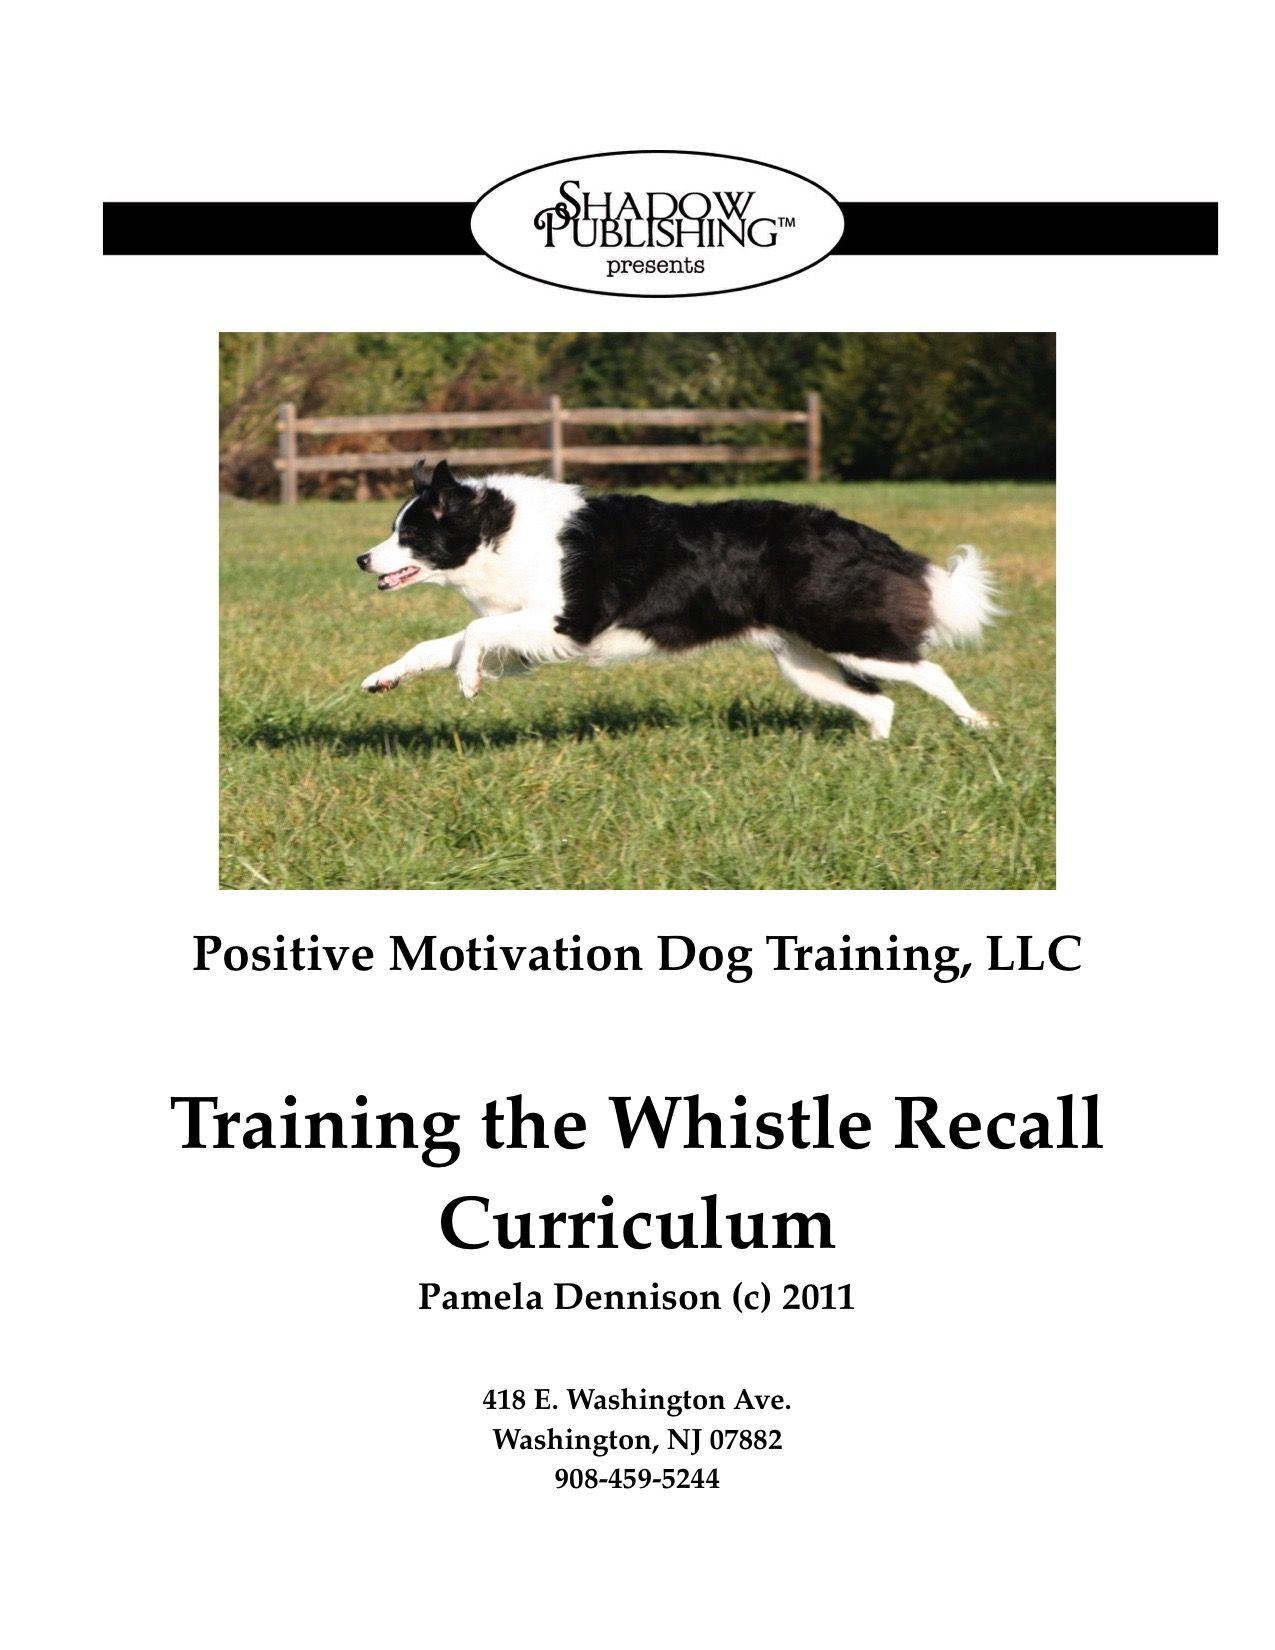 Training A Dog While Working A Full Time Job Dog Training Dog